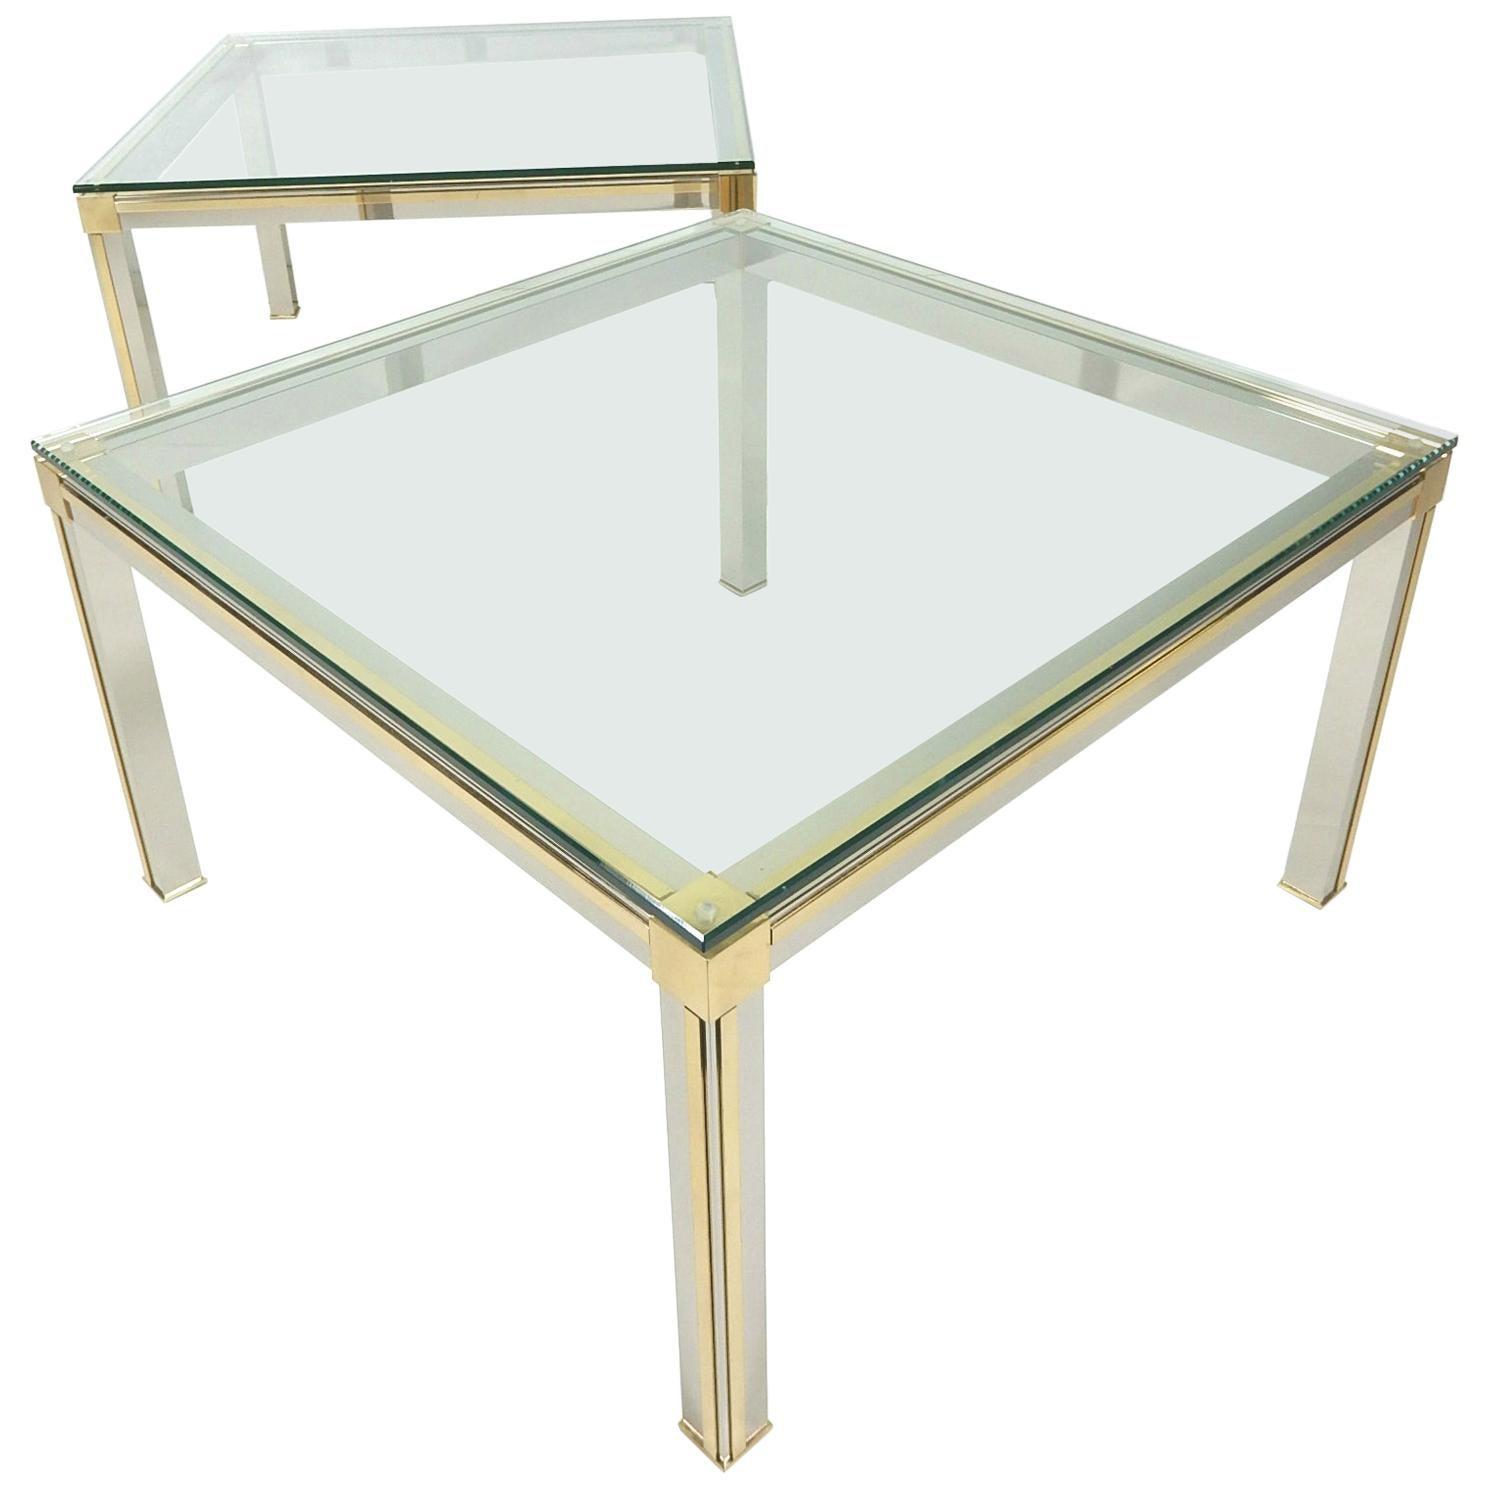 1970s Chrome, Brass and Glass Side Tables Romeo Rega